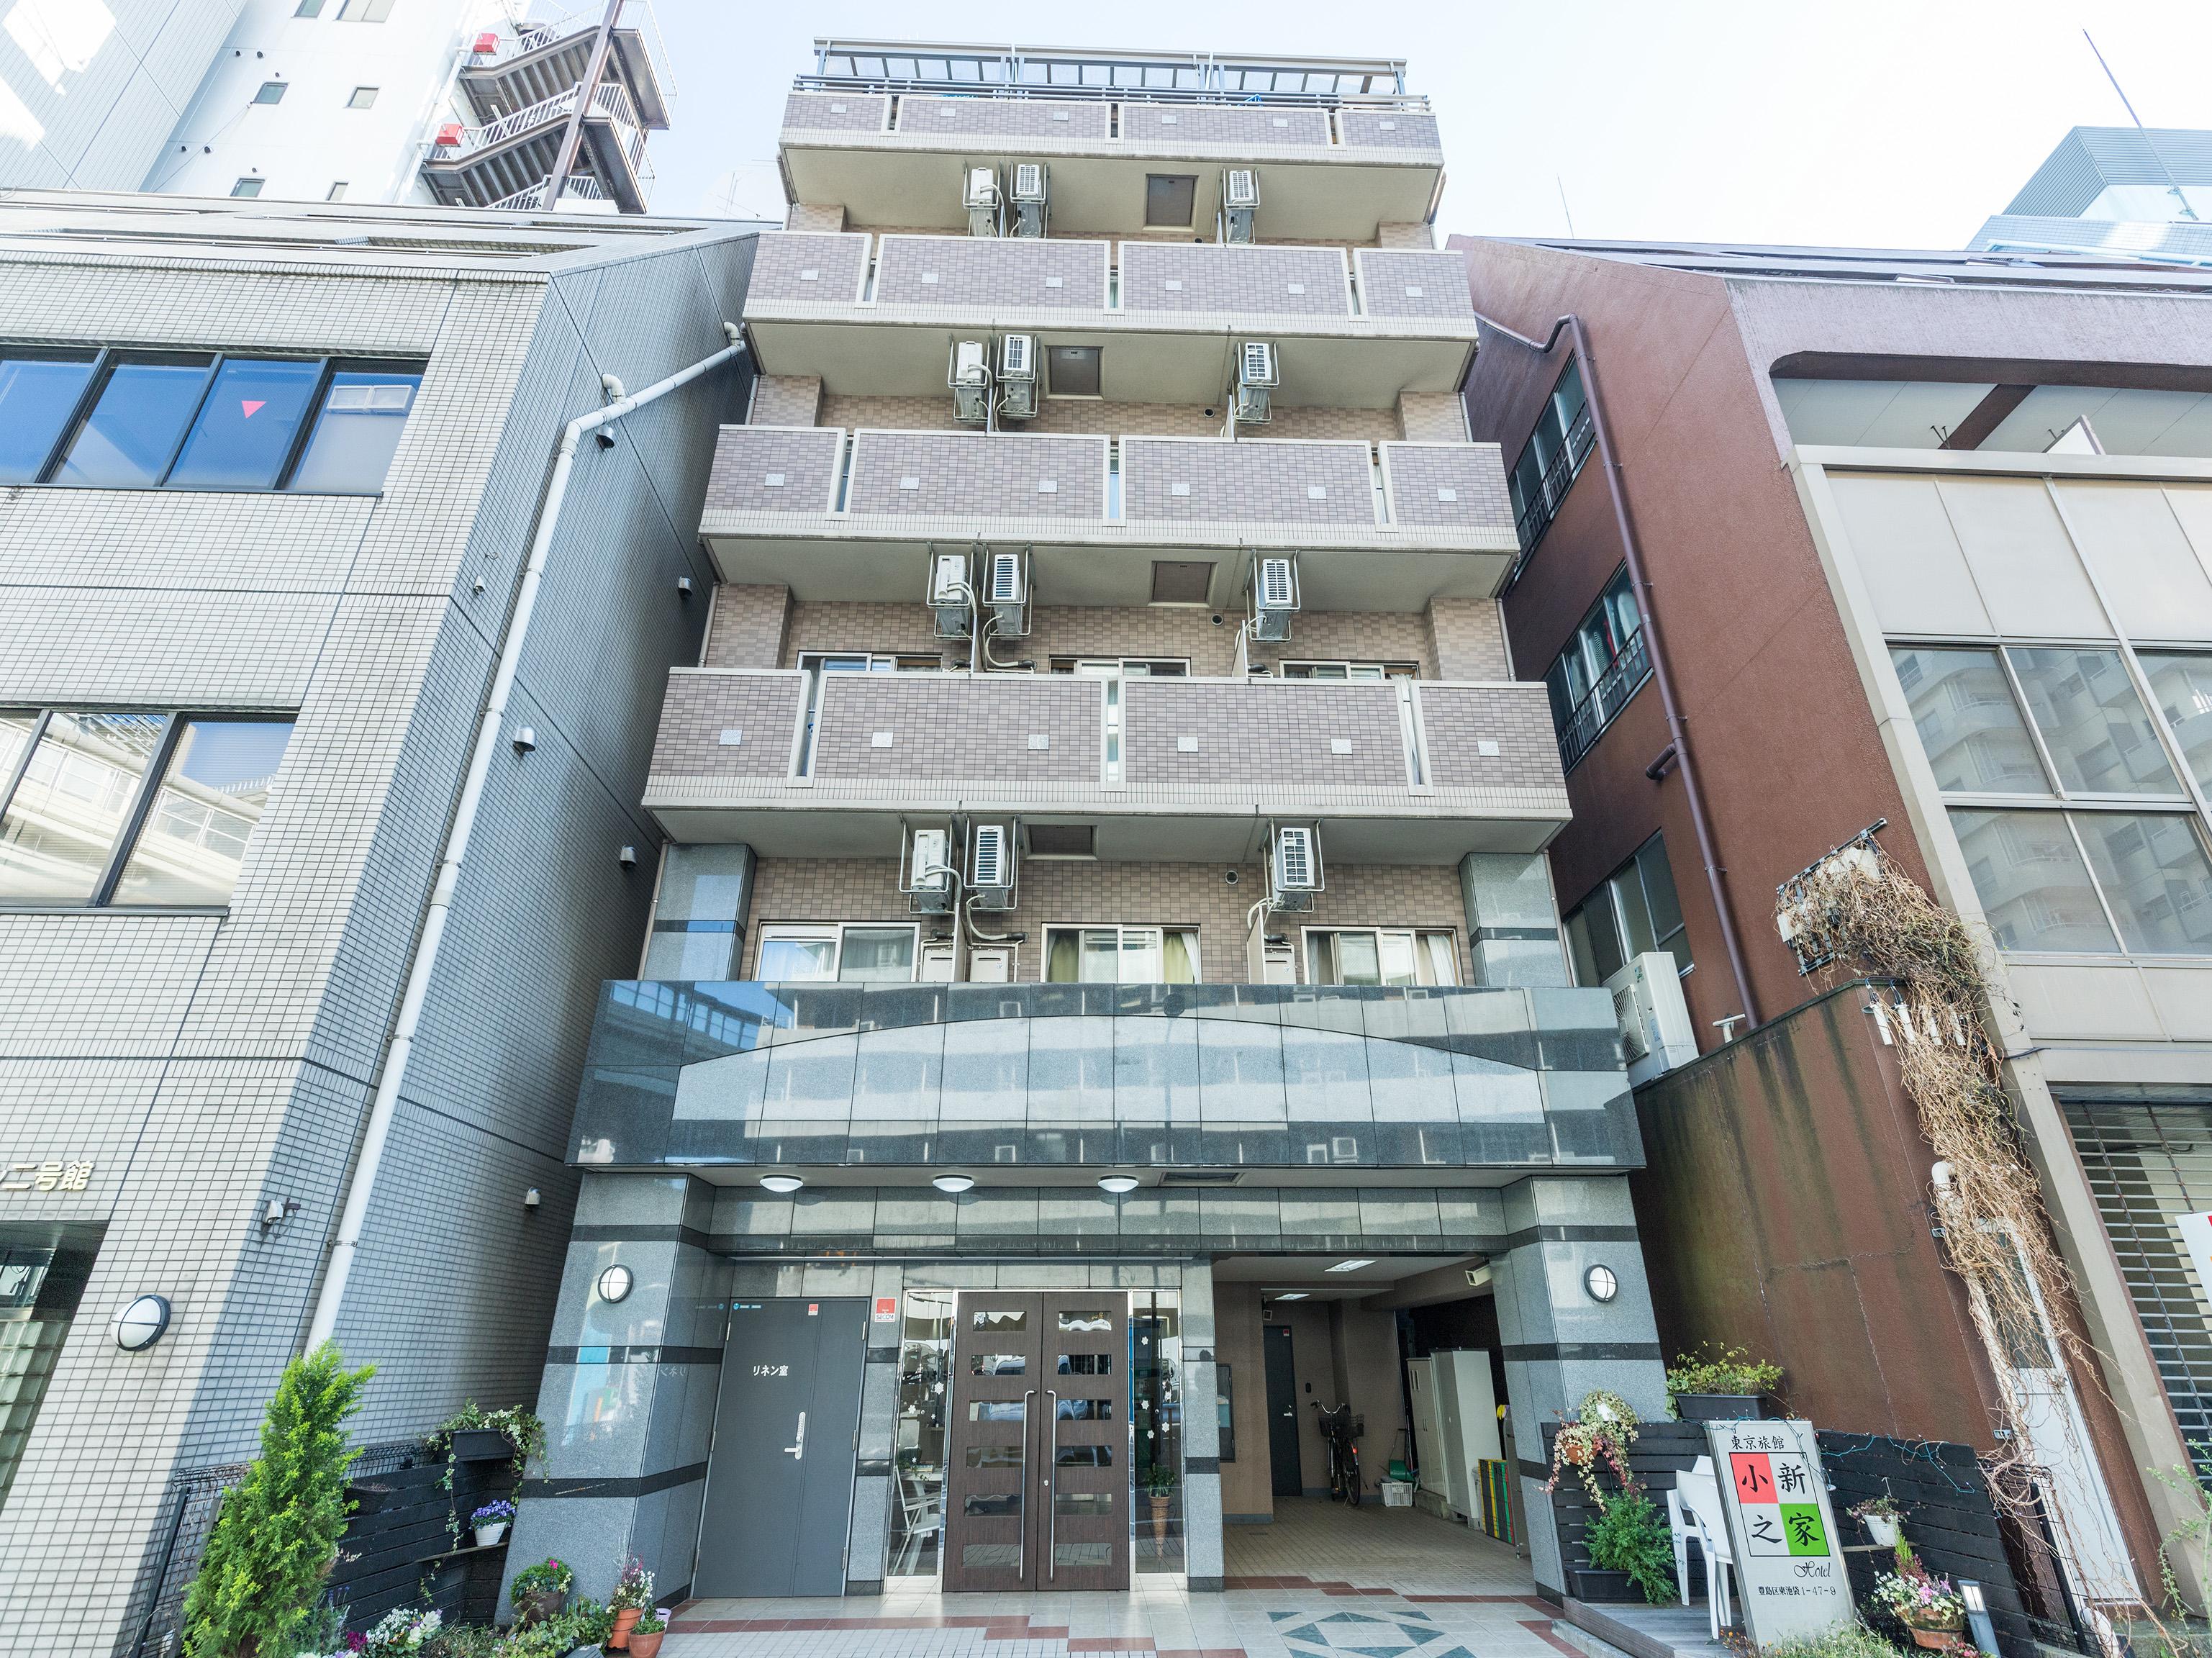 OYOホテル Tokyo Shin House 池袋の施設画像